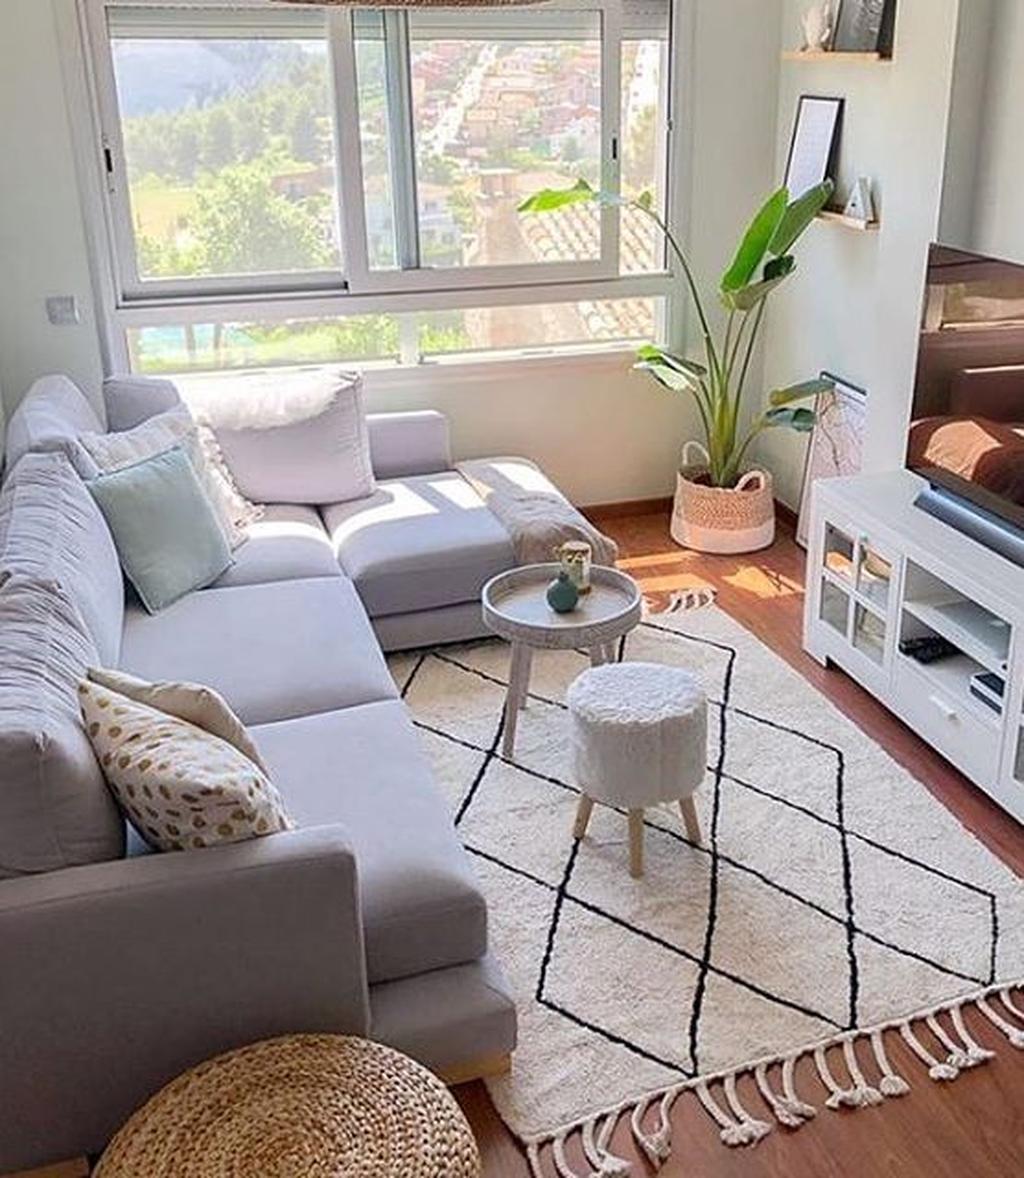 31 Admirable Cozy Living Room Decor Ideas Trendehouse Living Room Decor Apartment Small Living Room Decor Small Apartment Living